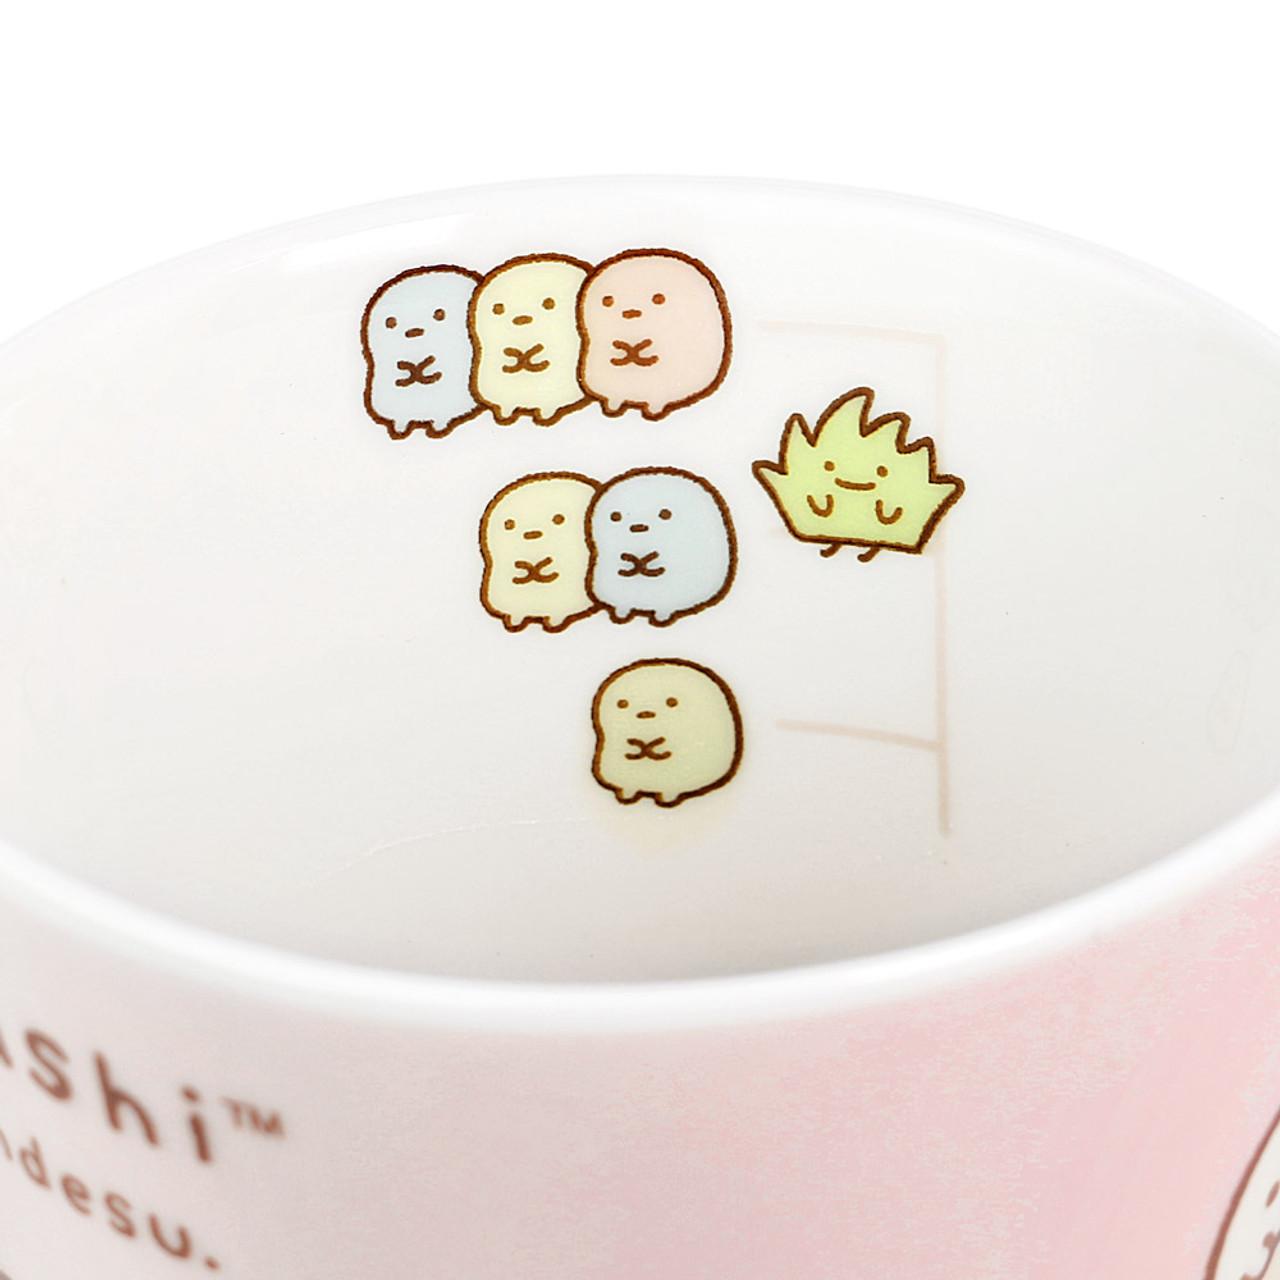 Sumikko Gurashi Measure Ceramic Mug - Horizontal ( Inner View )